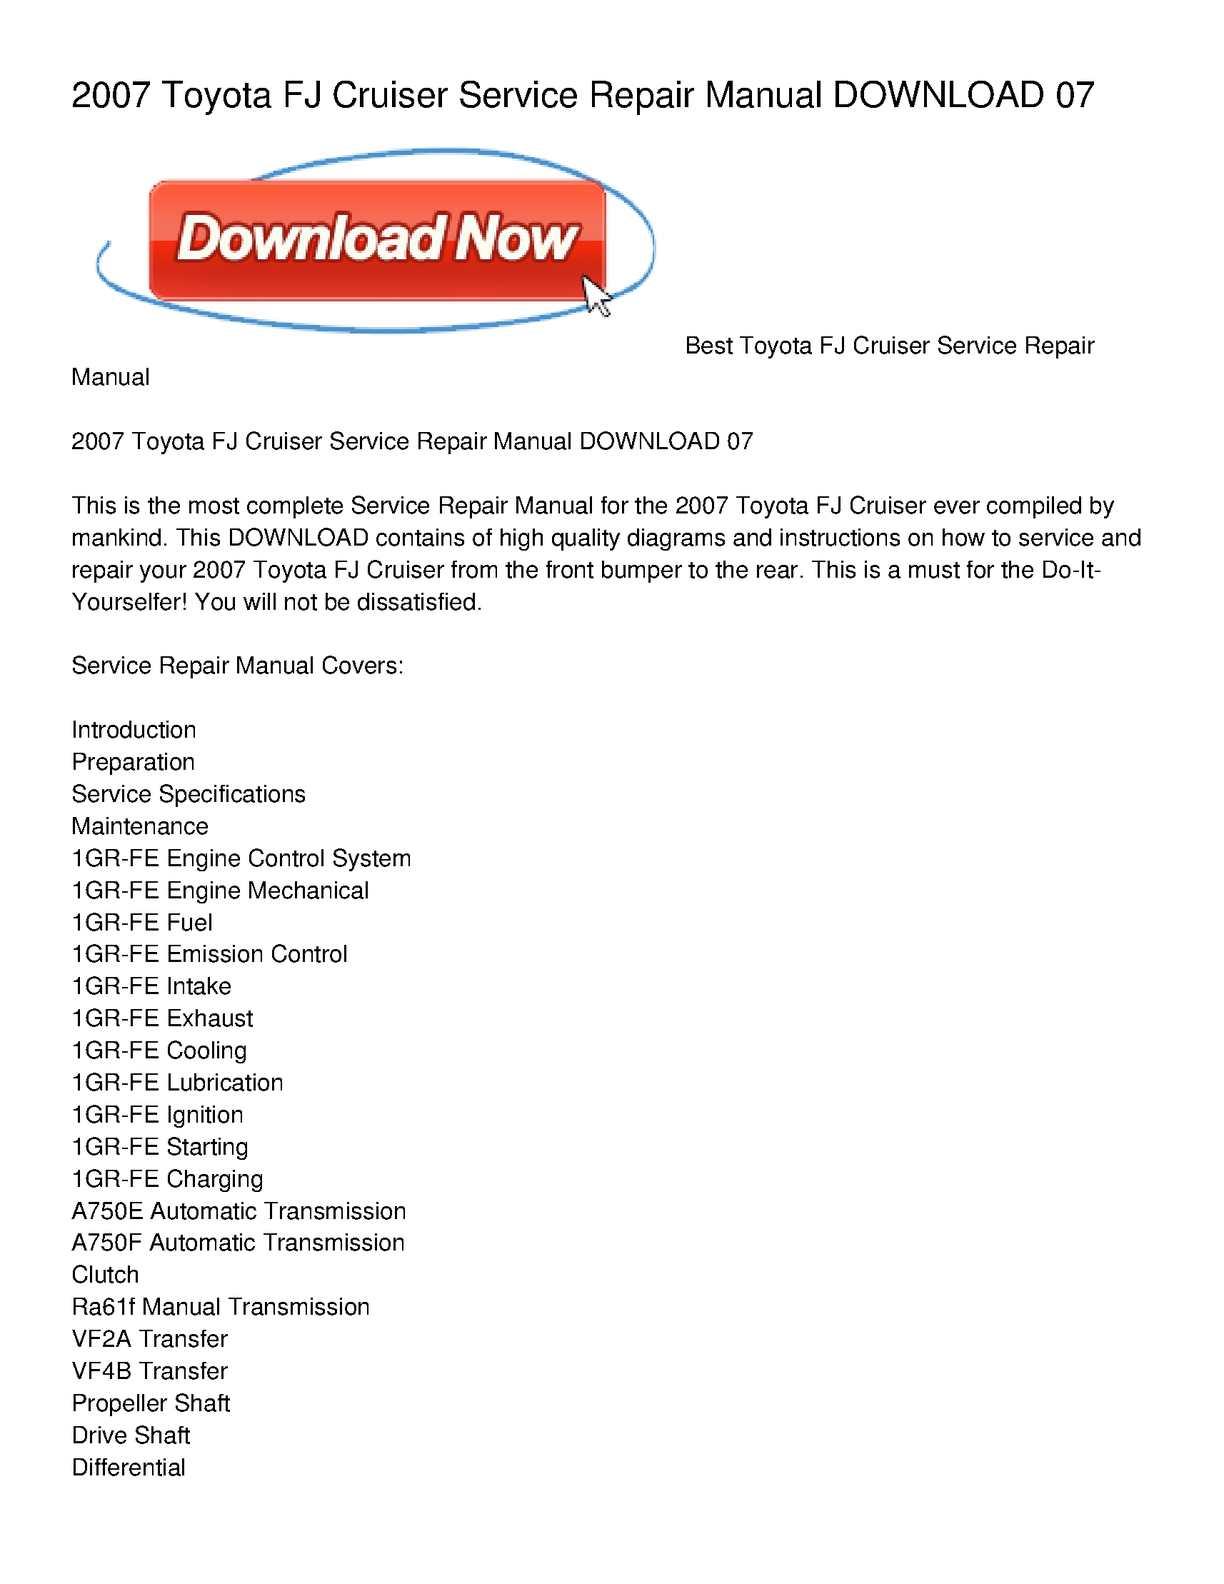 Calamo 2007 Toyota Fj Cruiser Service Repair Manual Download 07 Automatic Transmission Diagram On Mechanical